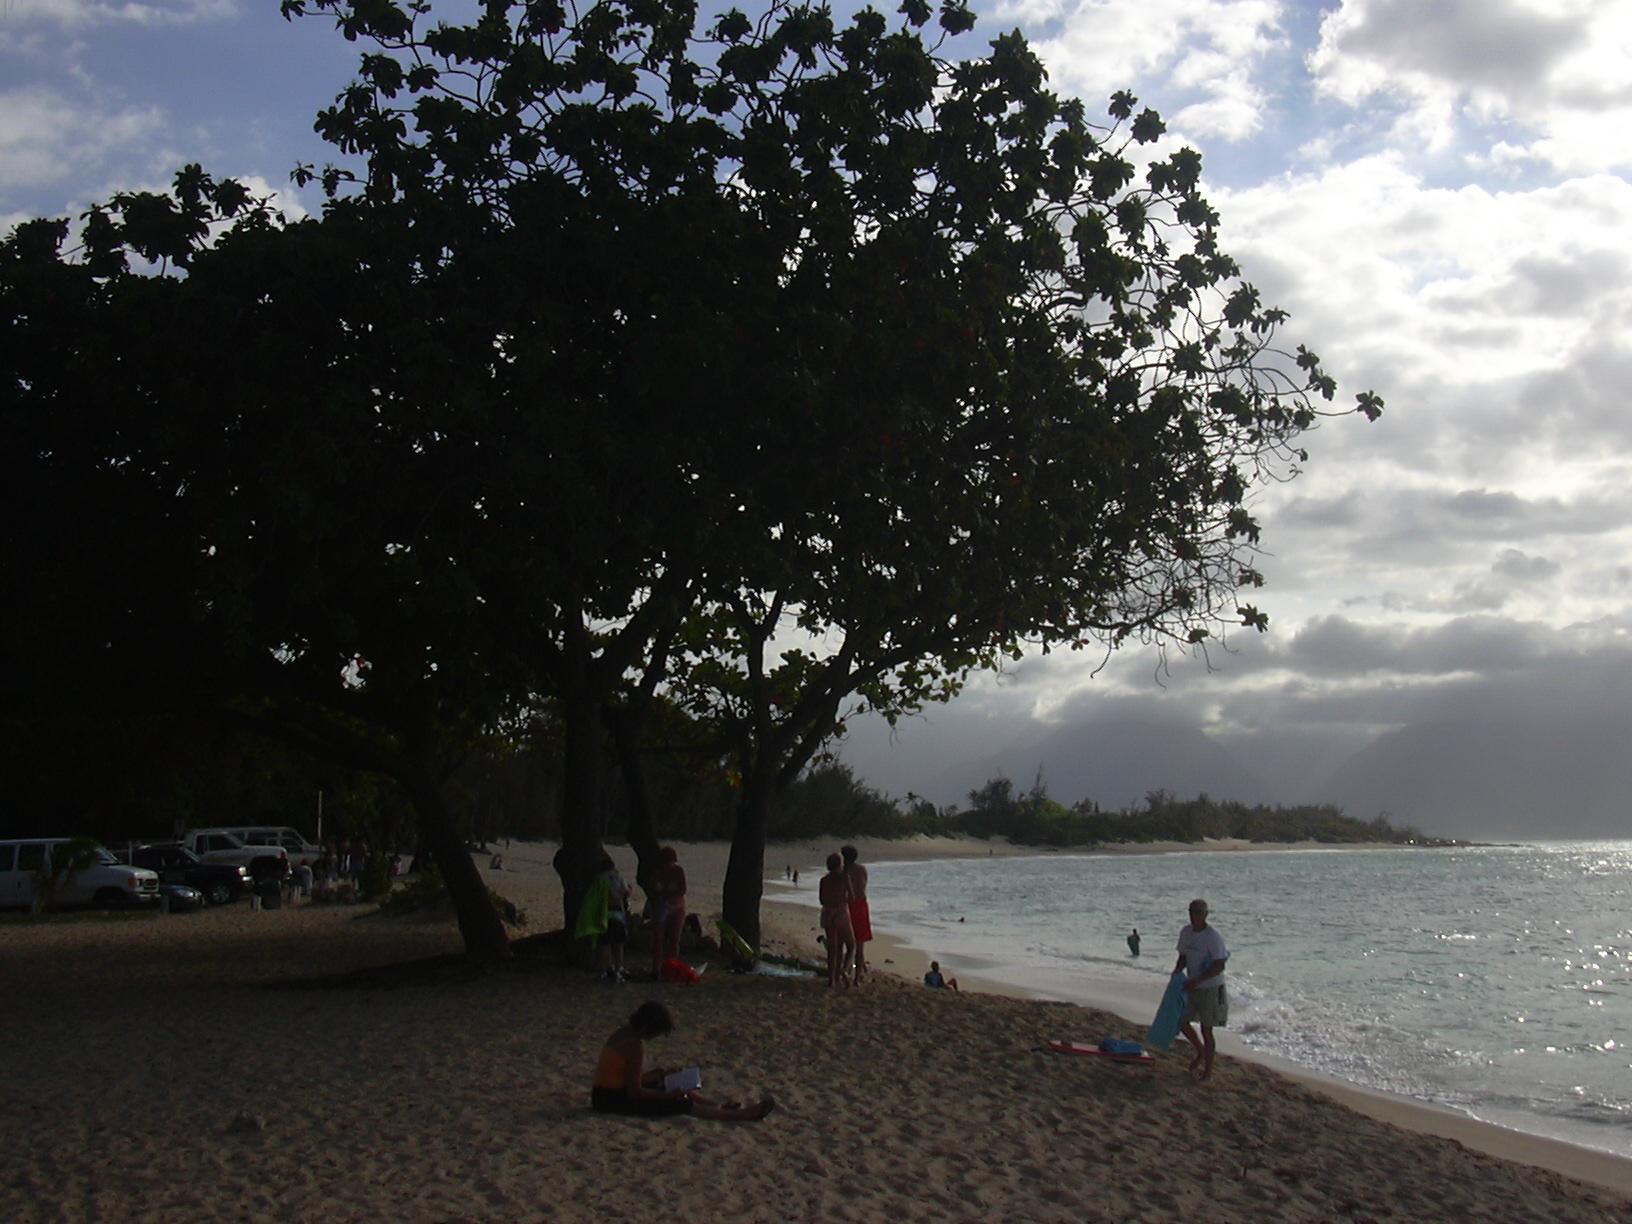 File:Starr-040805-0013-Terminalia catappa-habit-Baldwin Beach-Maui (24347792269).jpg